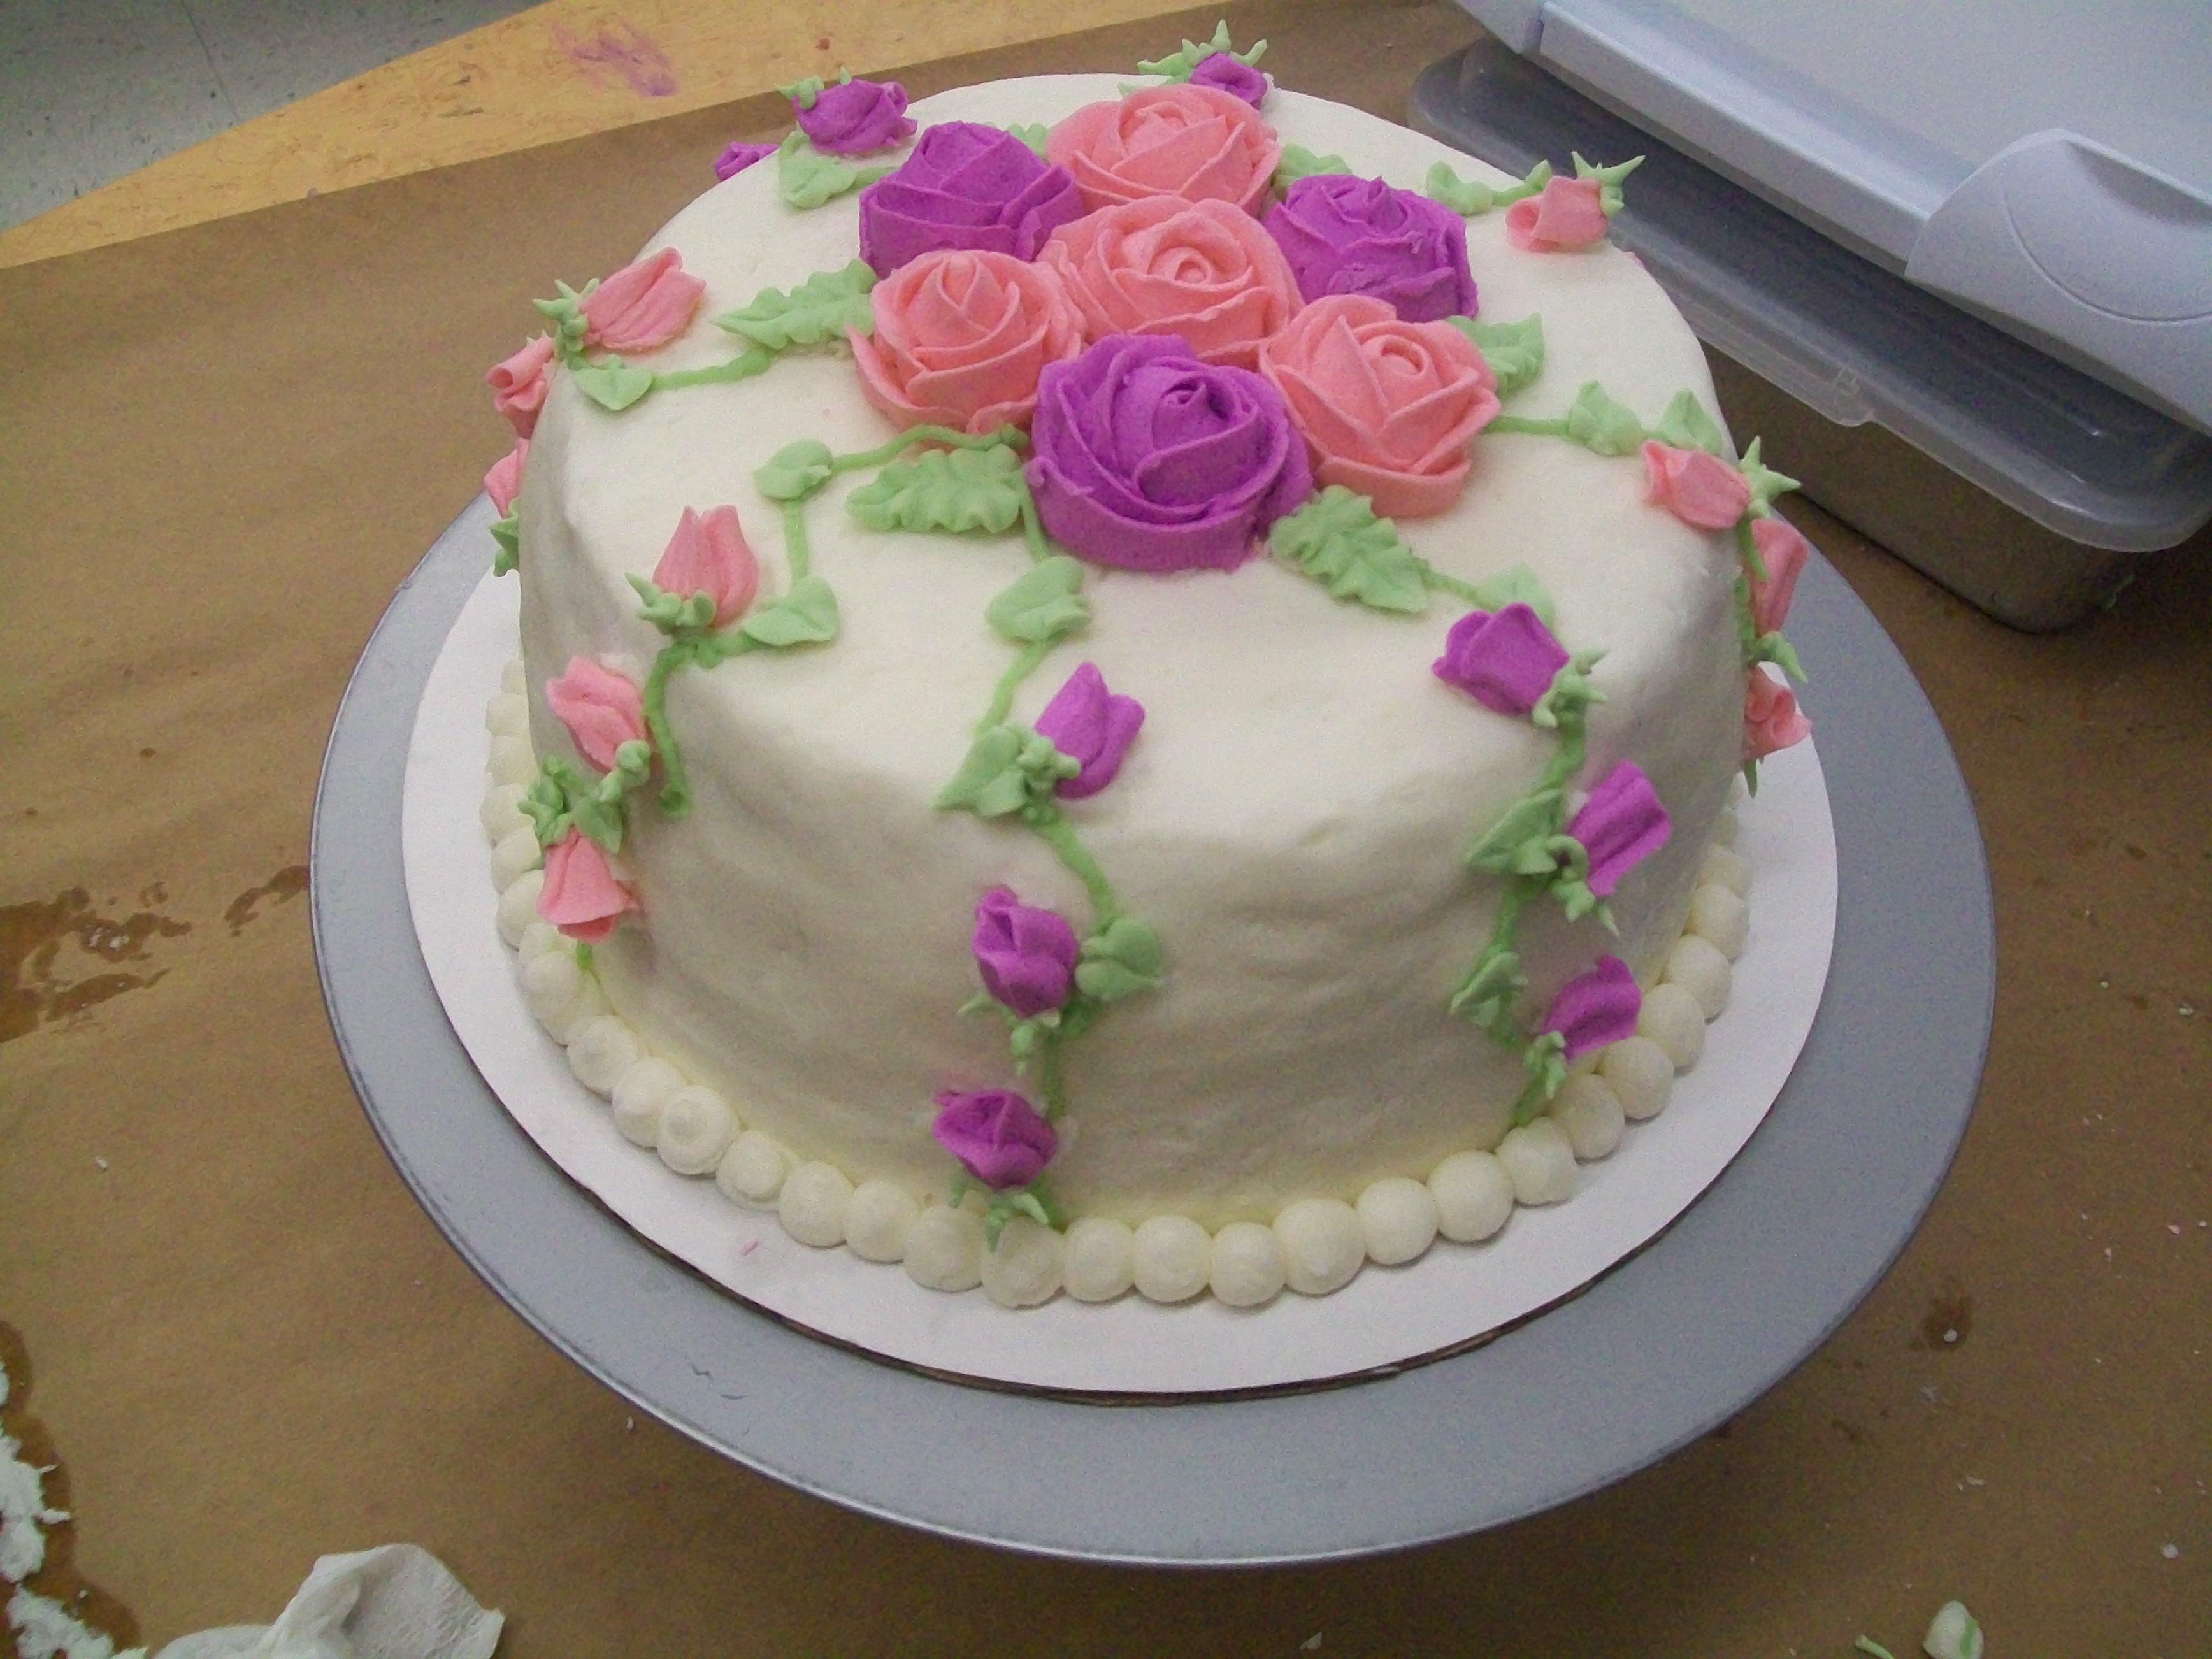 My Rose Cake Creation {Wordless Wednesday & Linky} - My 3 Little Kittens